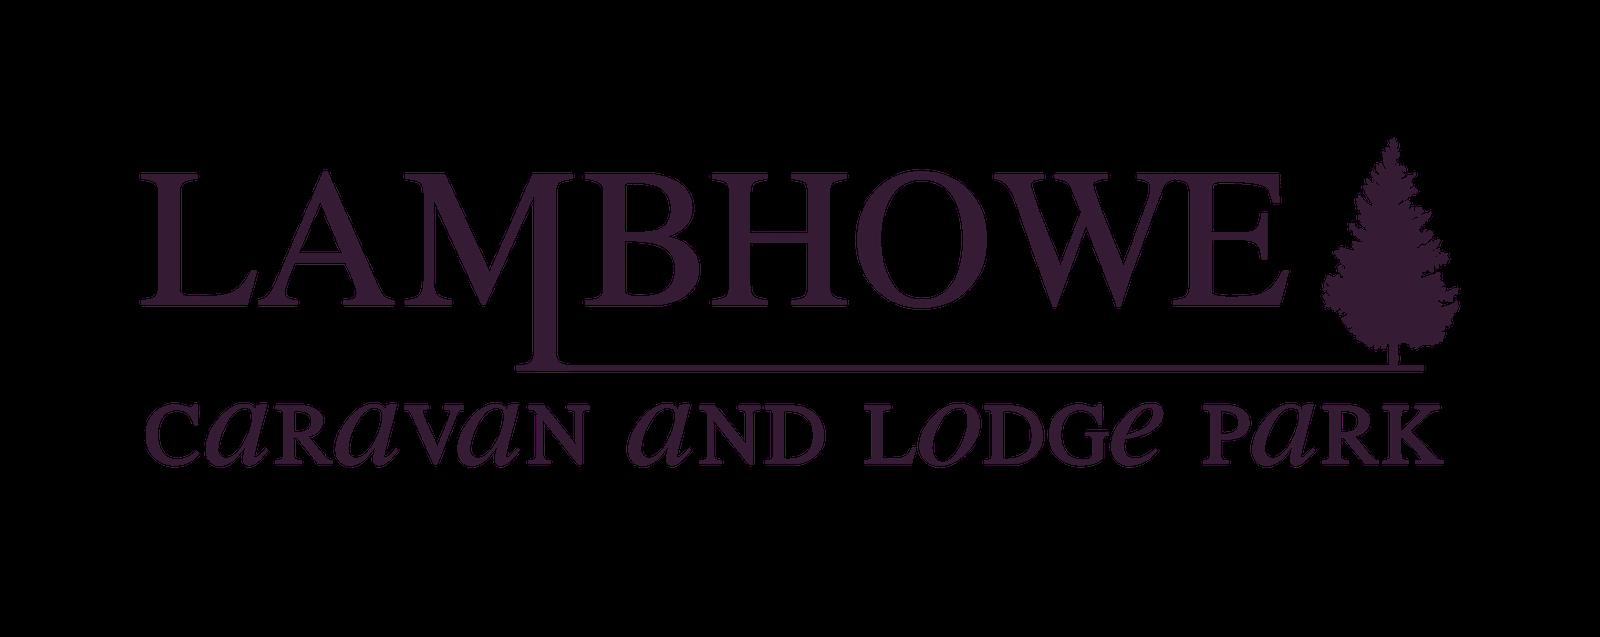 Lambhowe Caravan & Lodge Park